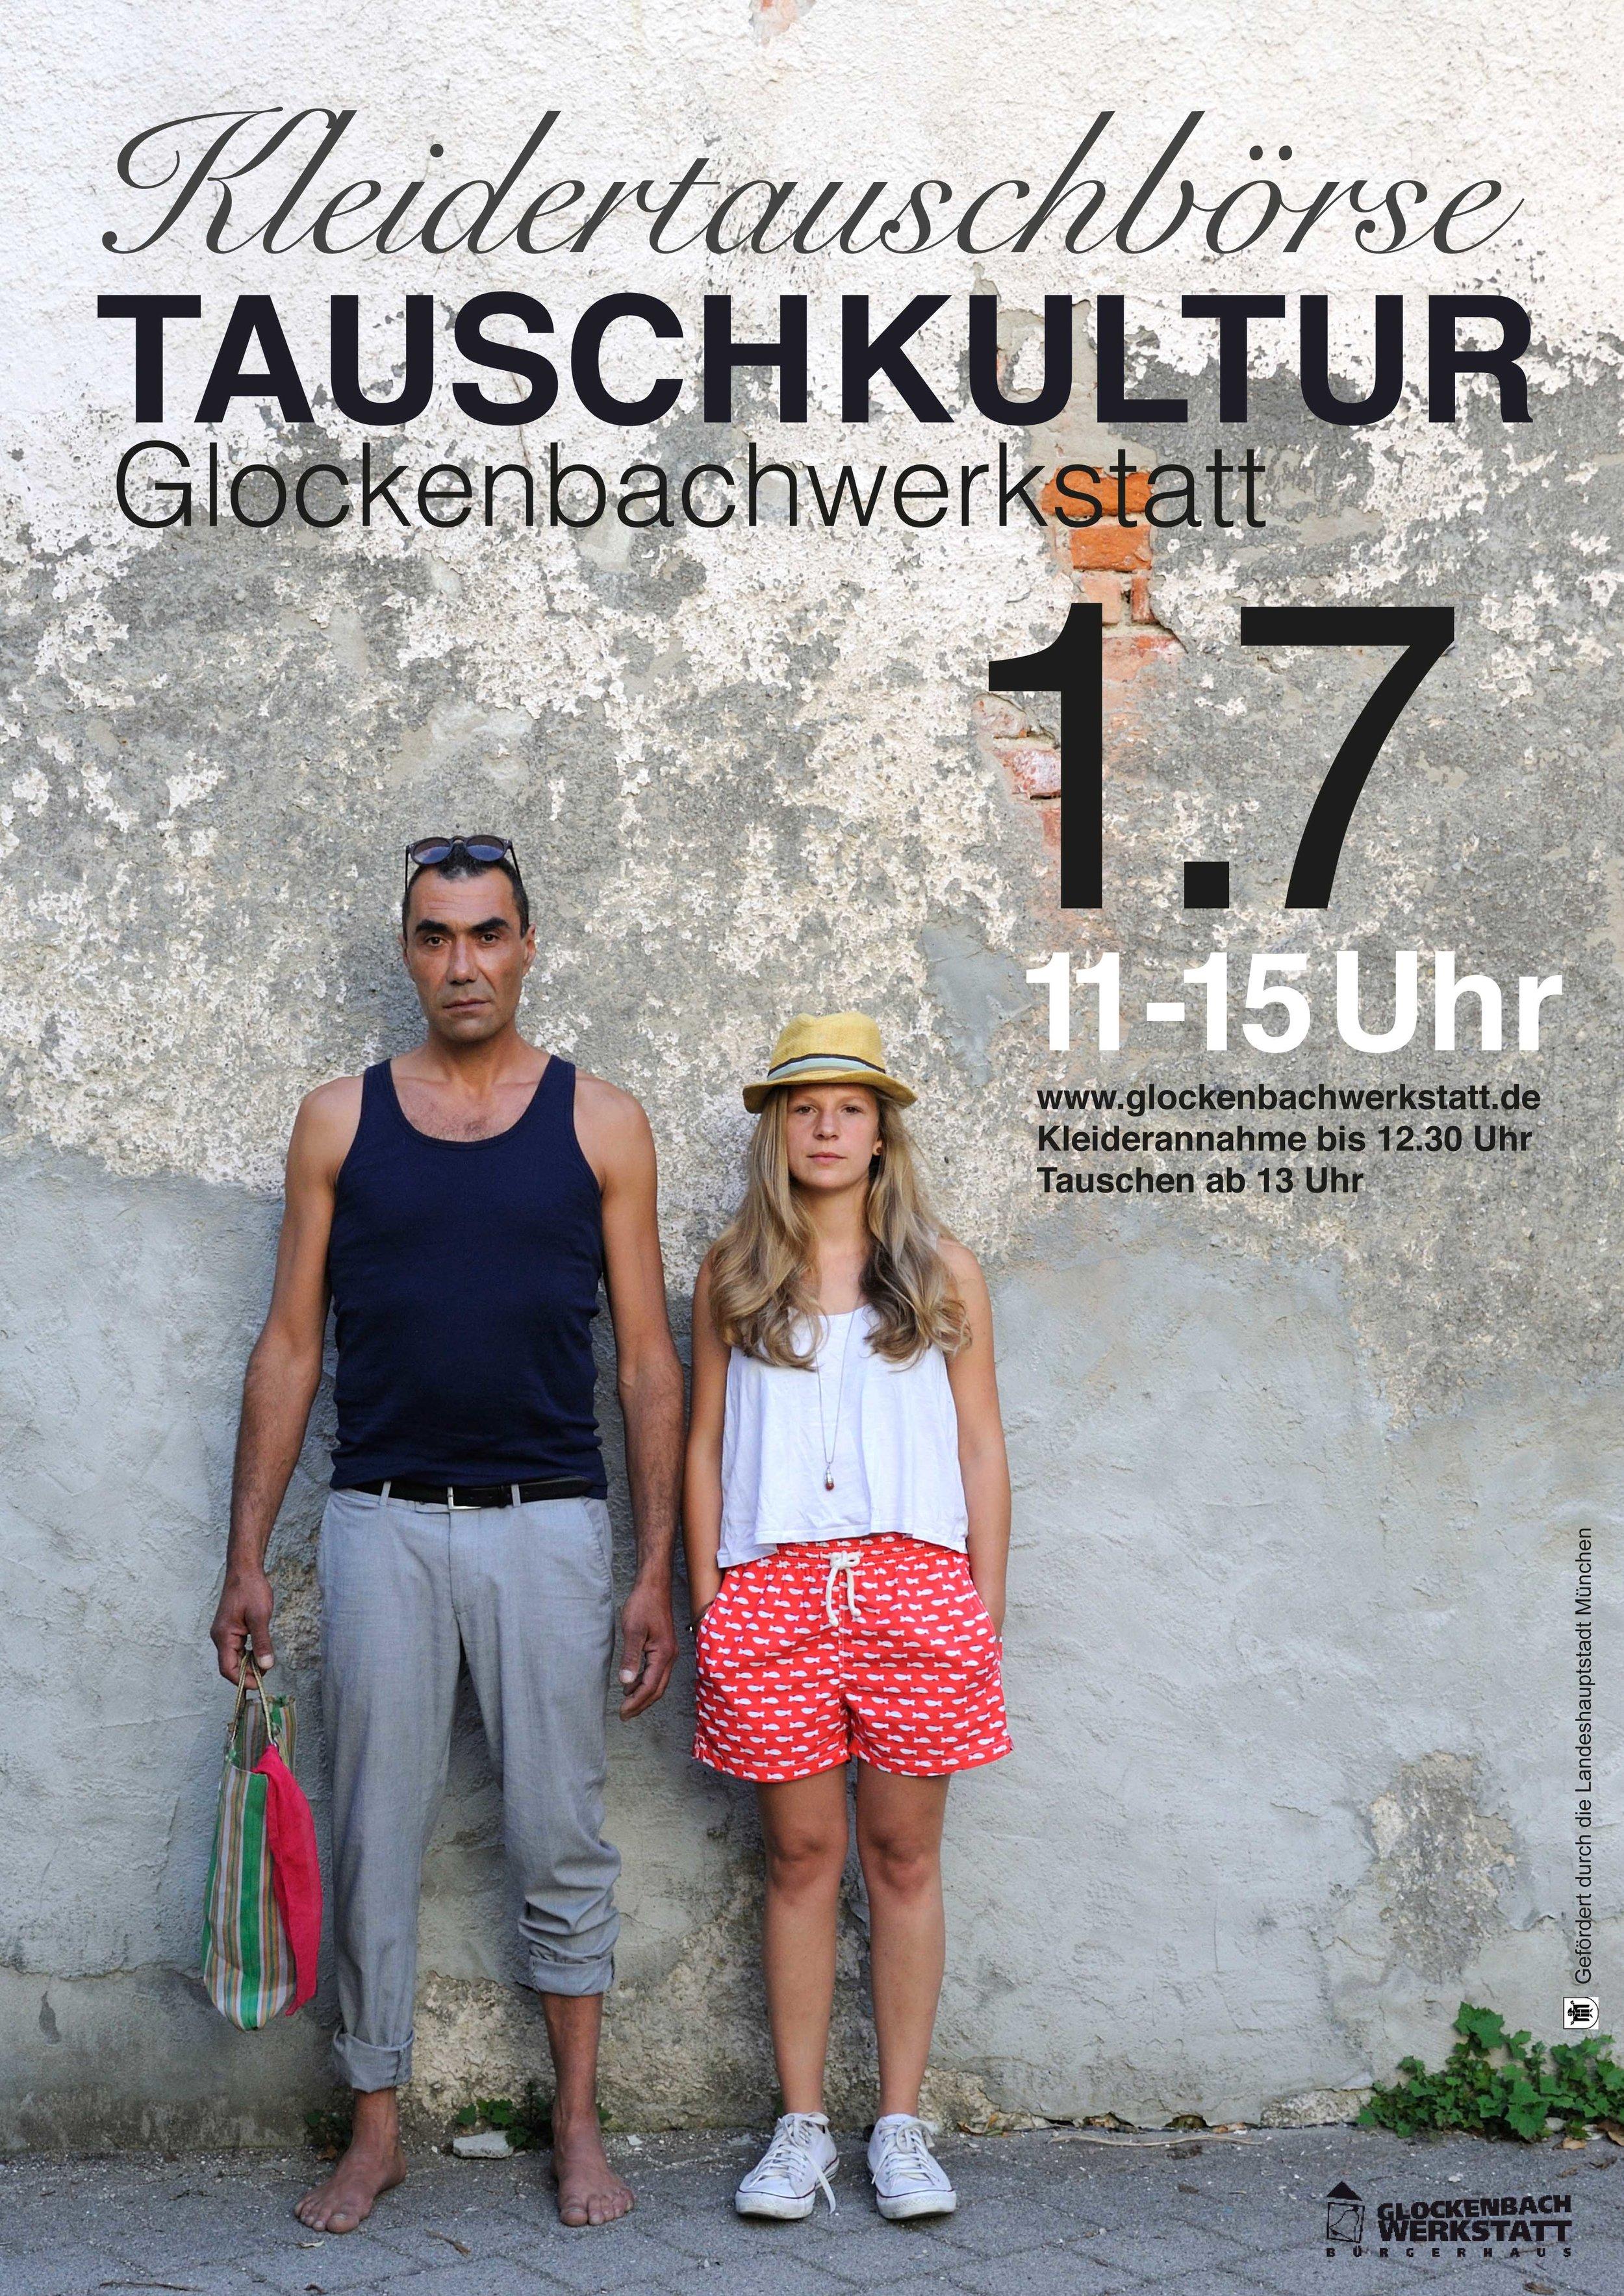 tauschkultur 07-17.jpg